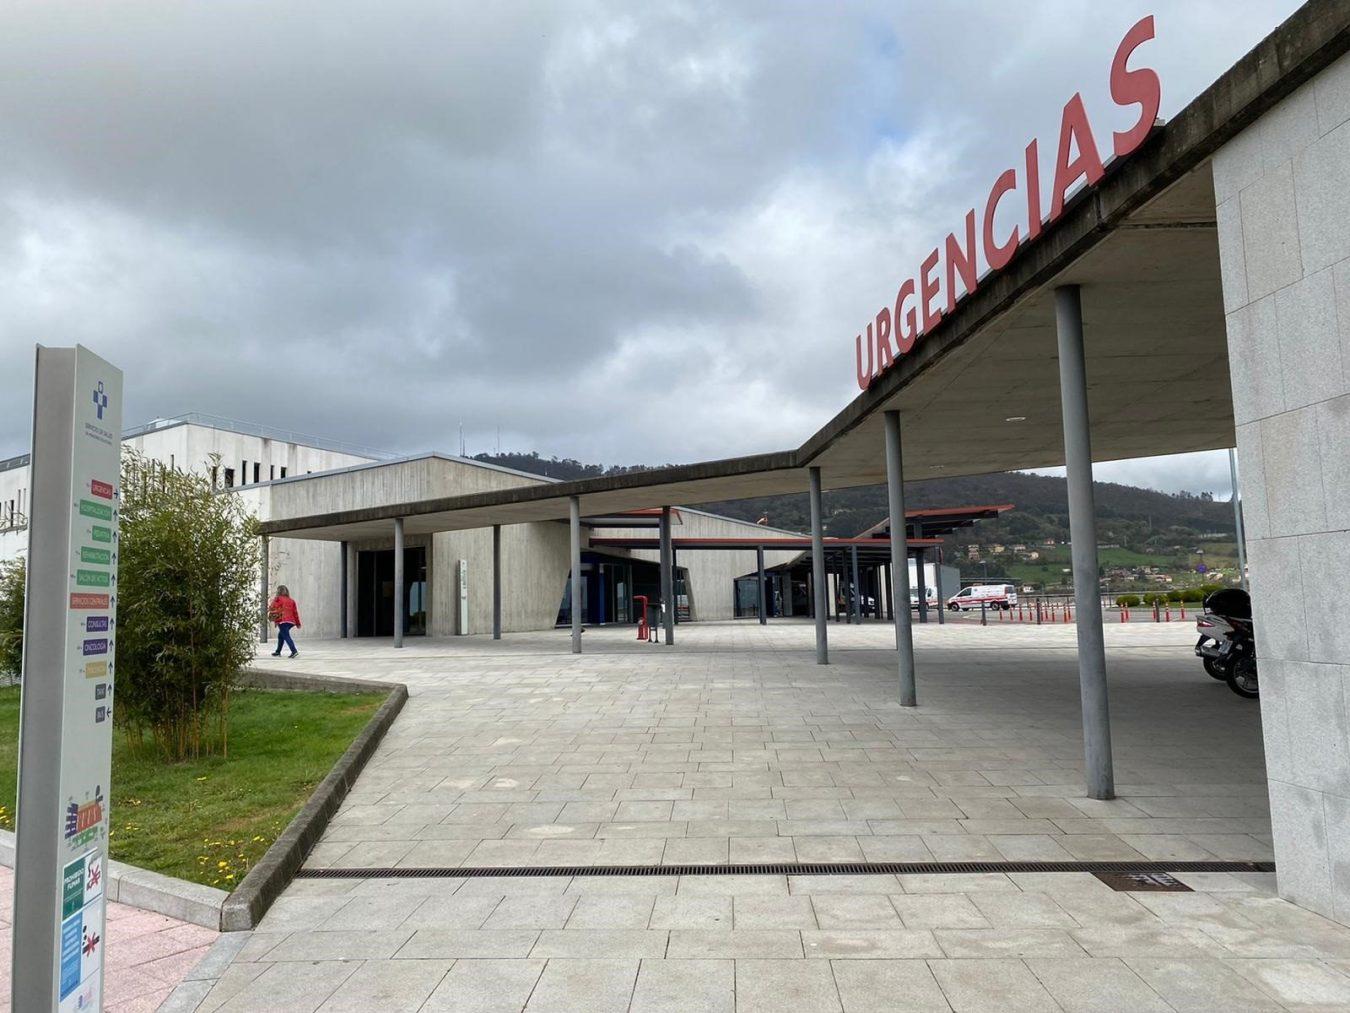 Asturias confirmó este lunes 8 nuevos casos positivos por coronavirus